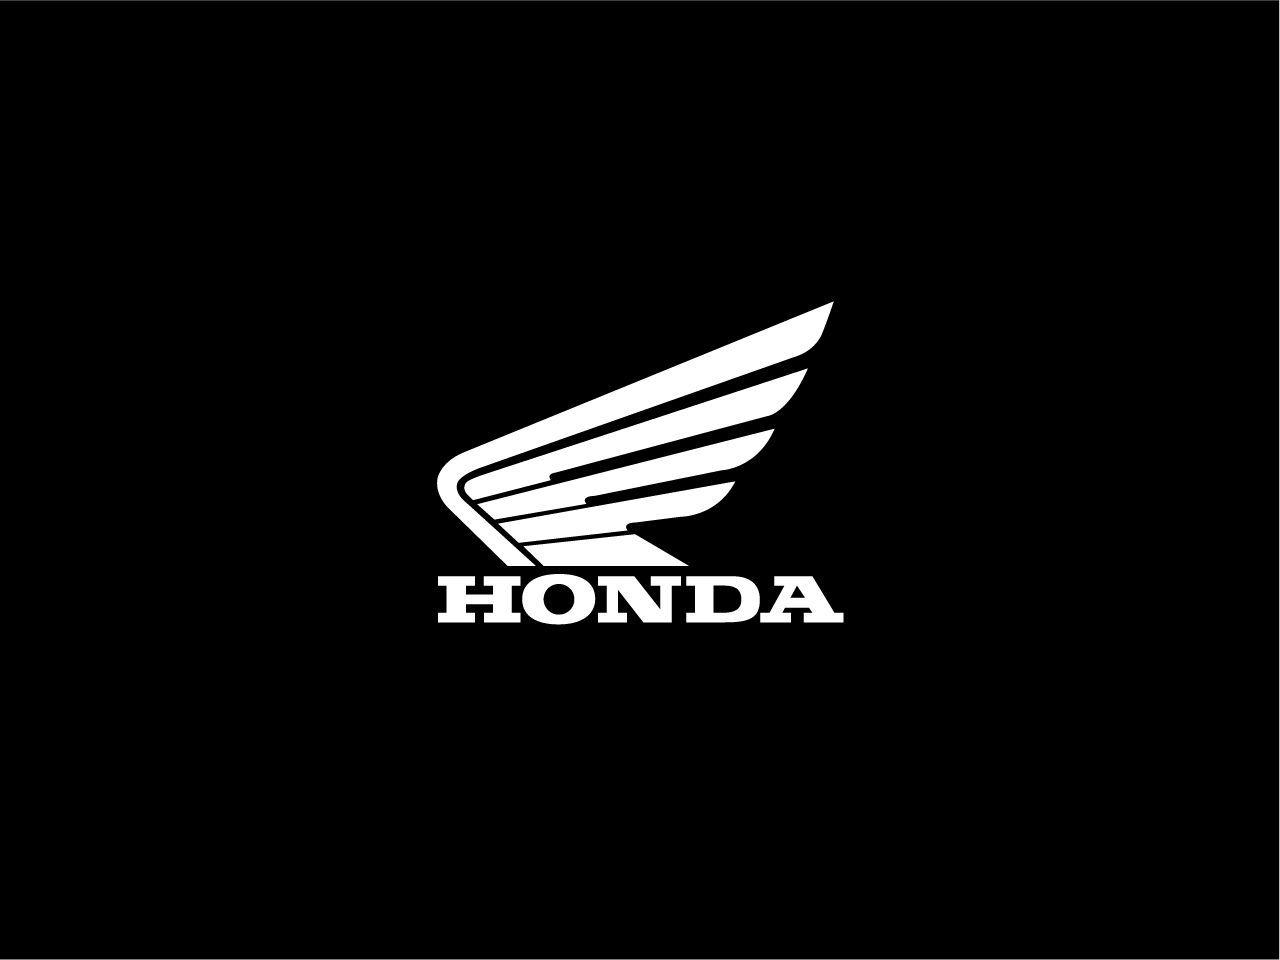 Honda Wallpaper The Wallpaper